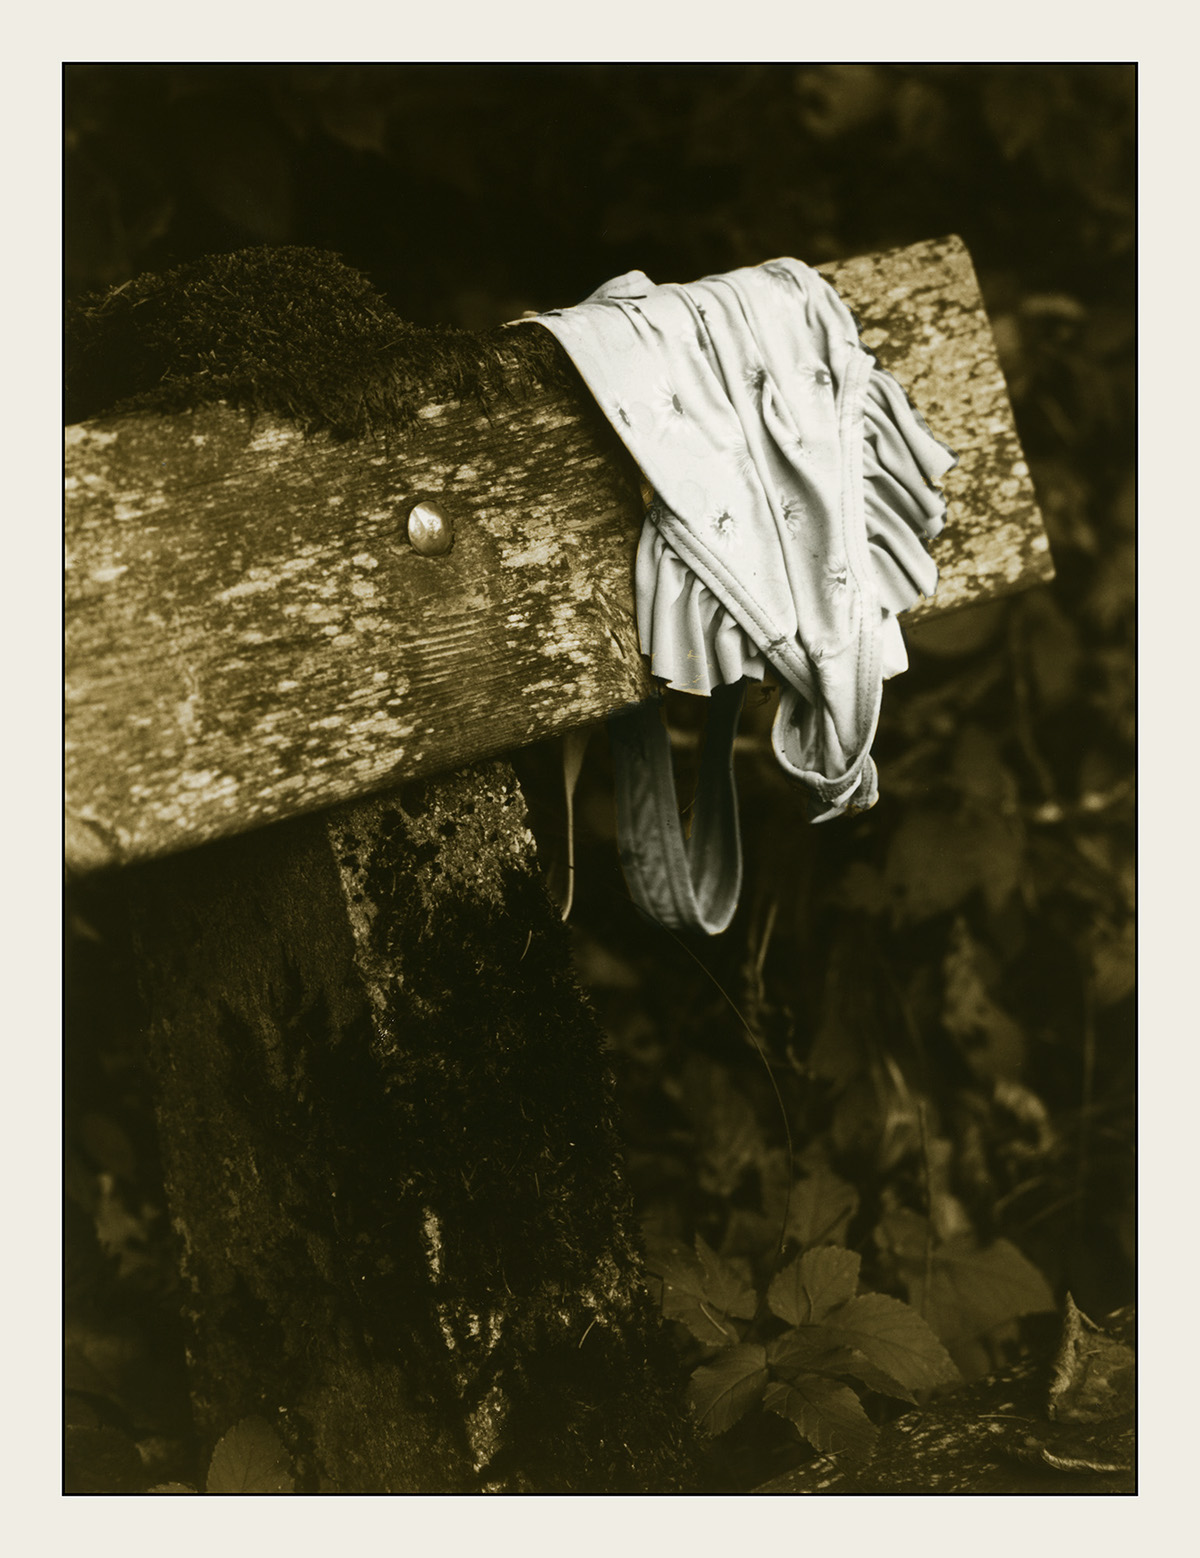 Adobe Portfolio mankind people trash Nature film photography darkroom